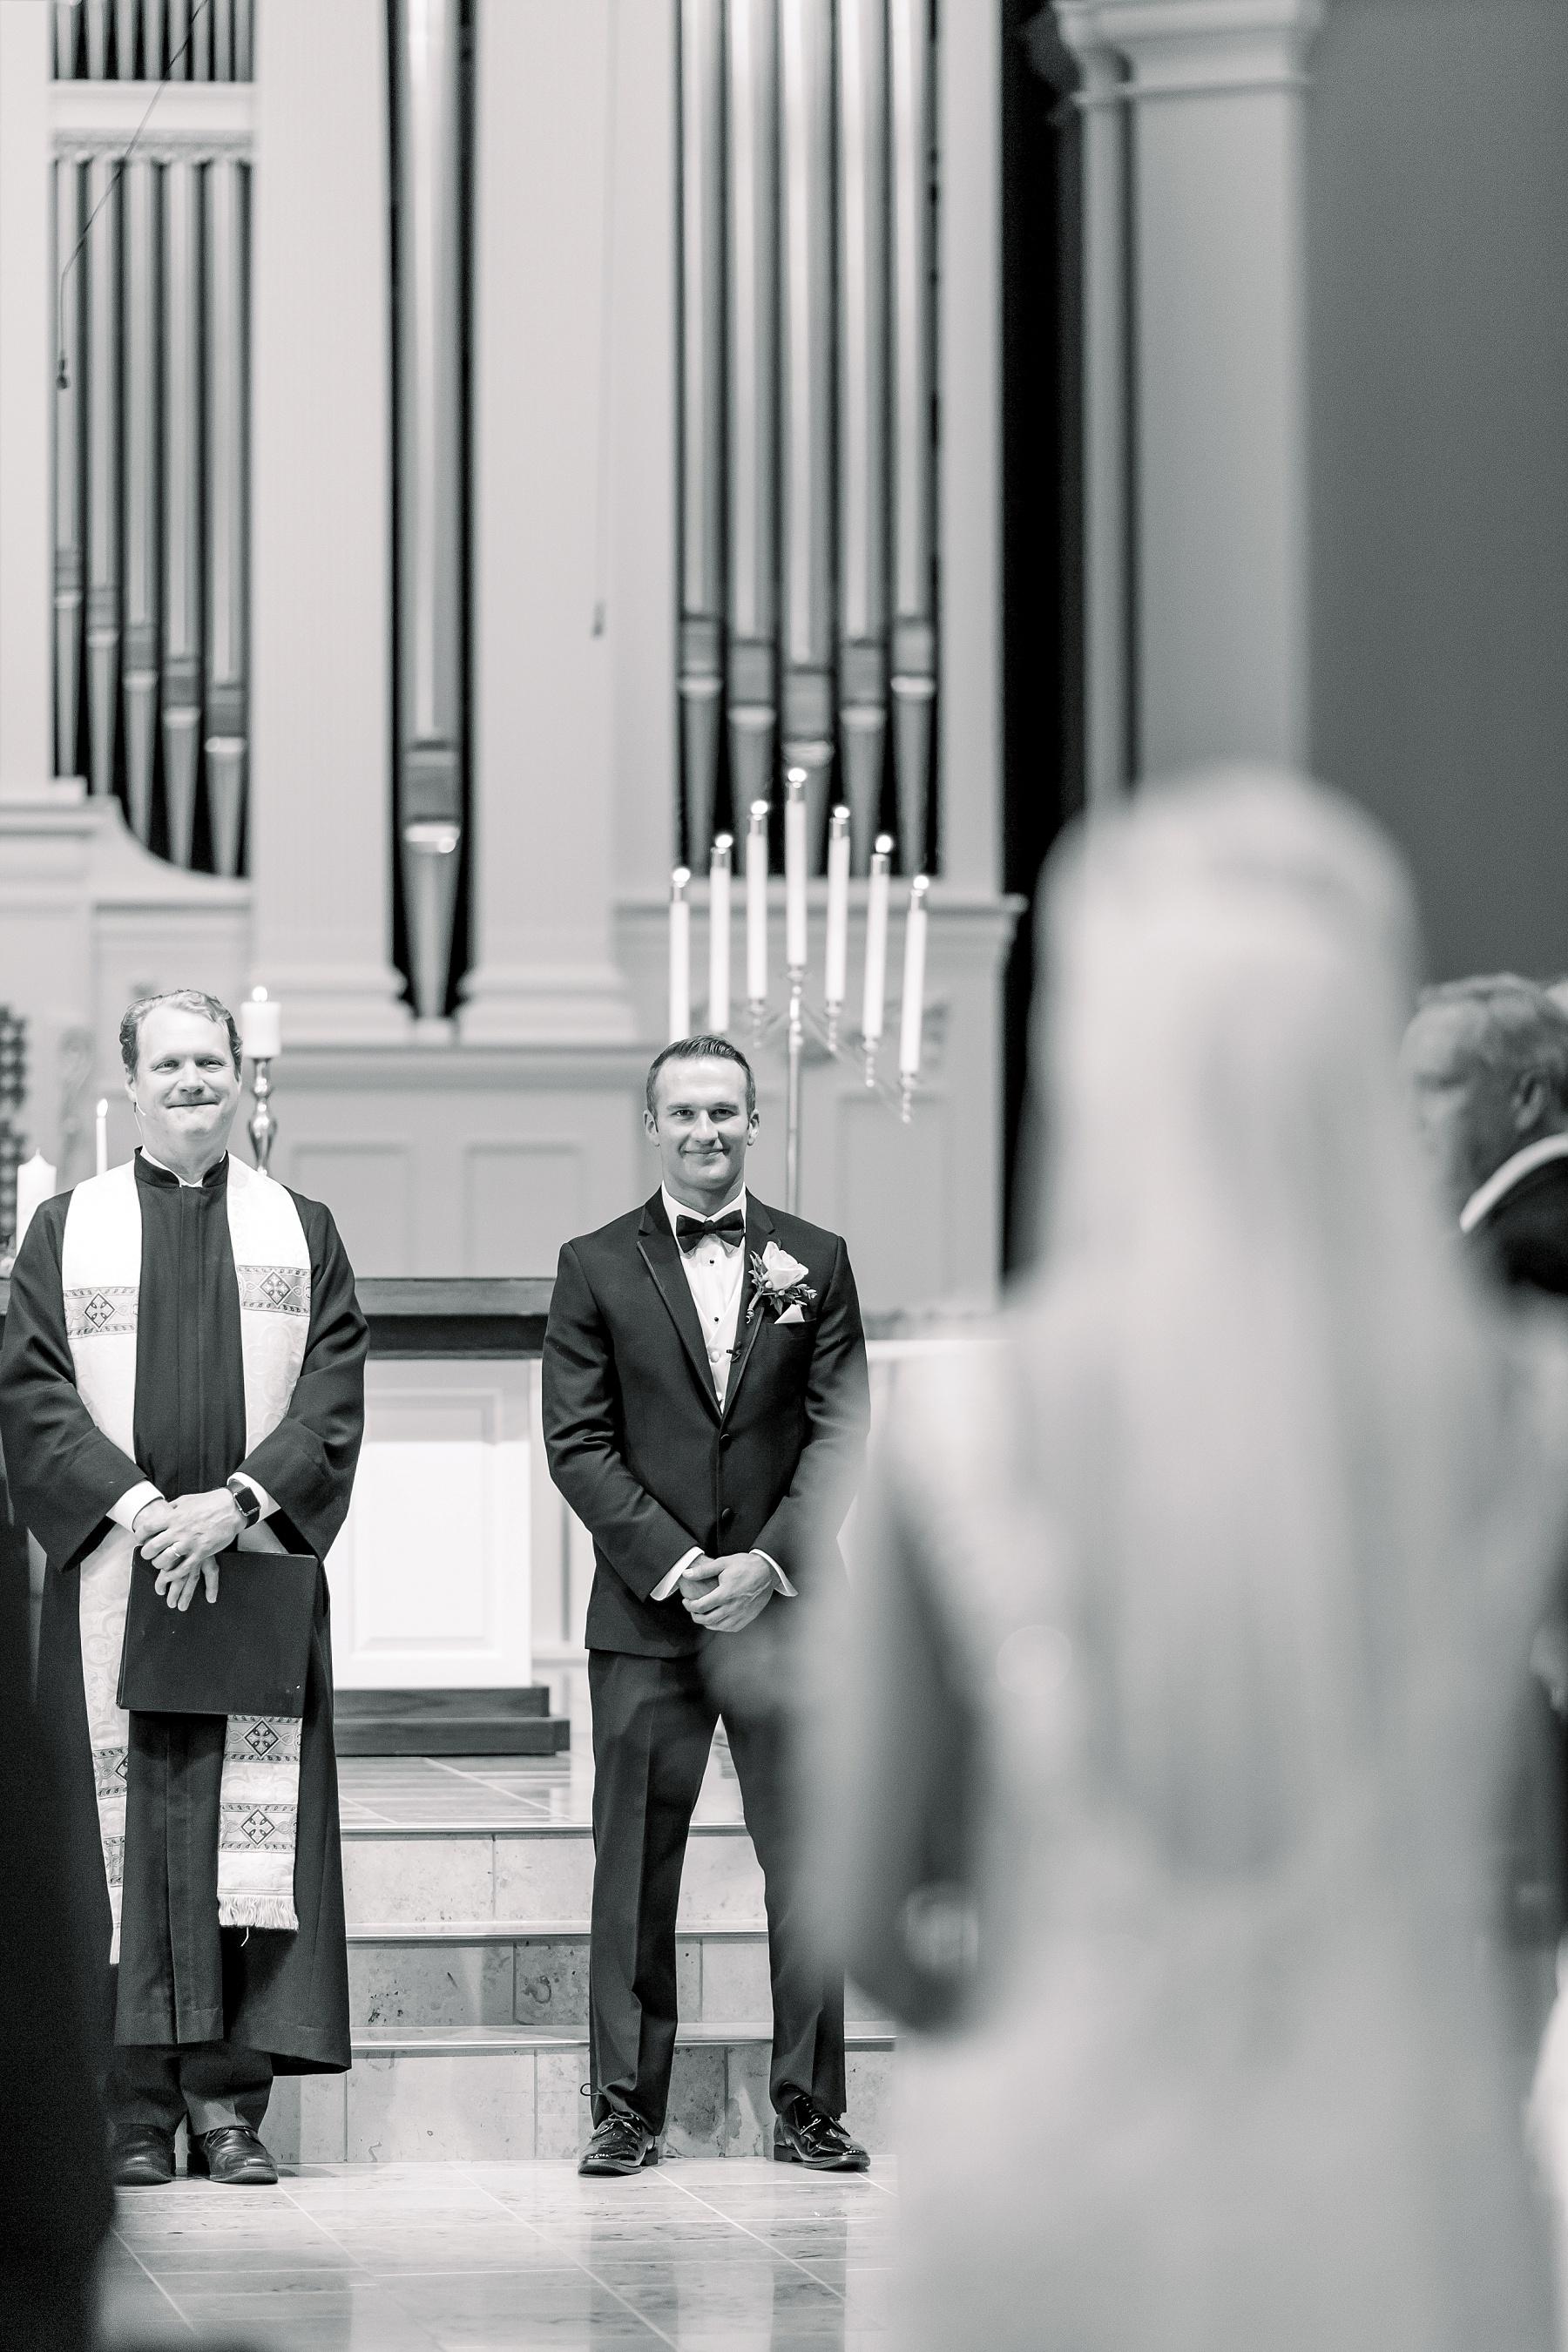 midwest-adventurous-wedding-photographer-elizabeth-ladean-photography-photo_4761.jpg